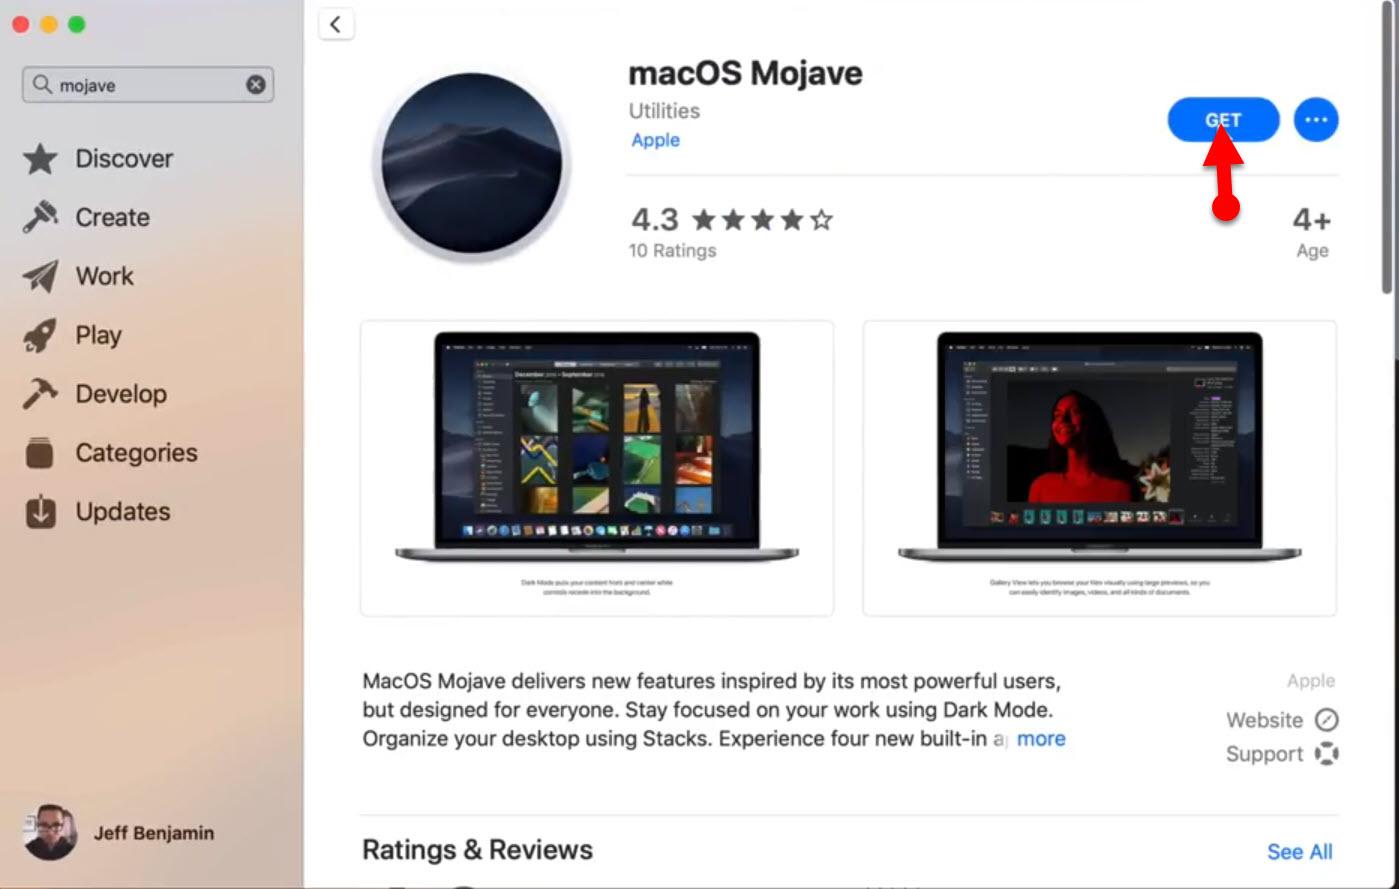 Get MacOS Mojave